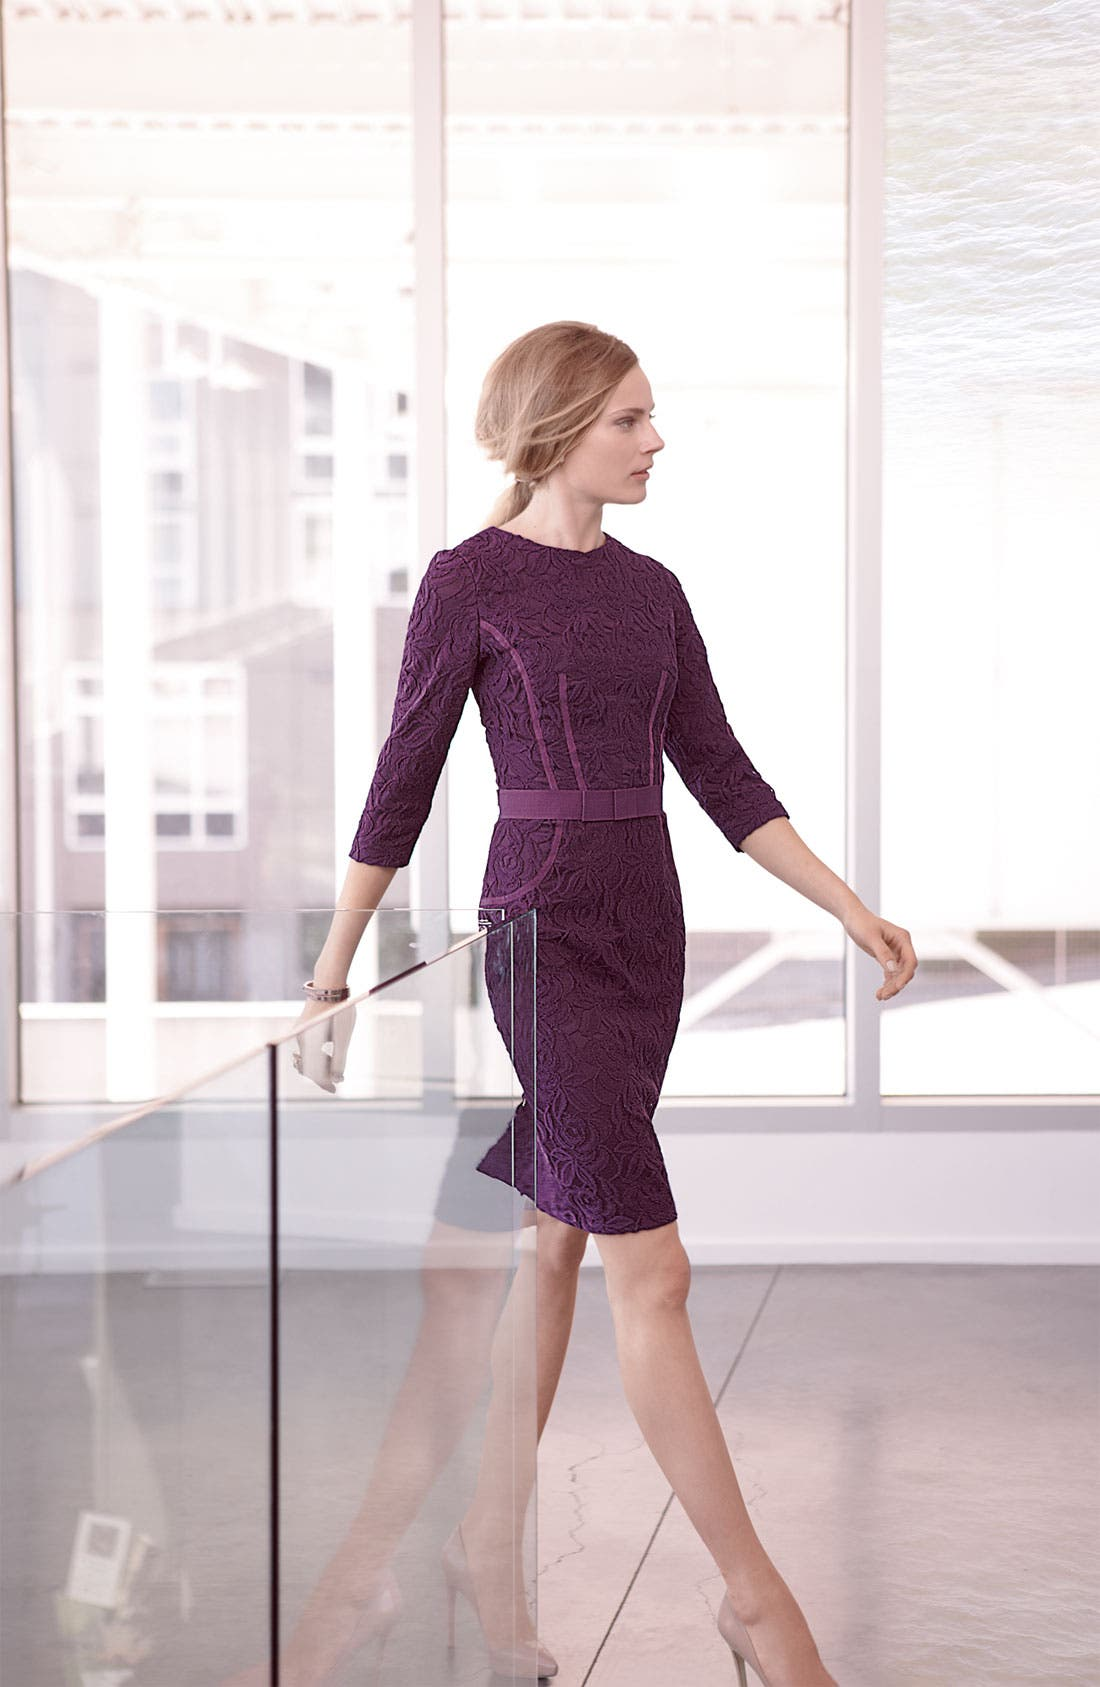 Main Image - Taylor Dresses Dress & Accessories